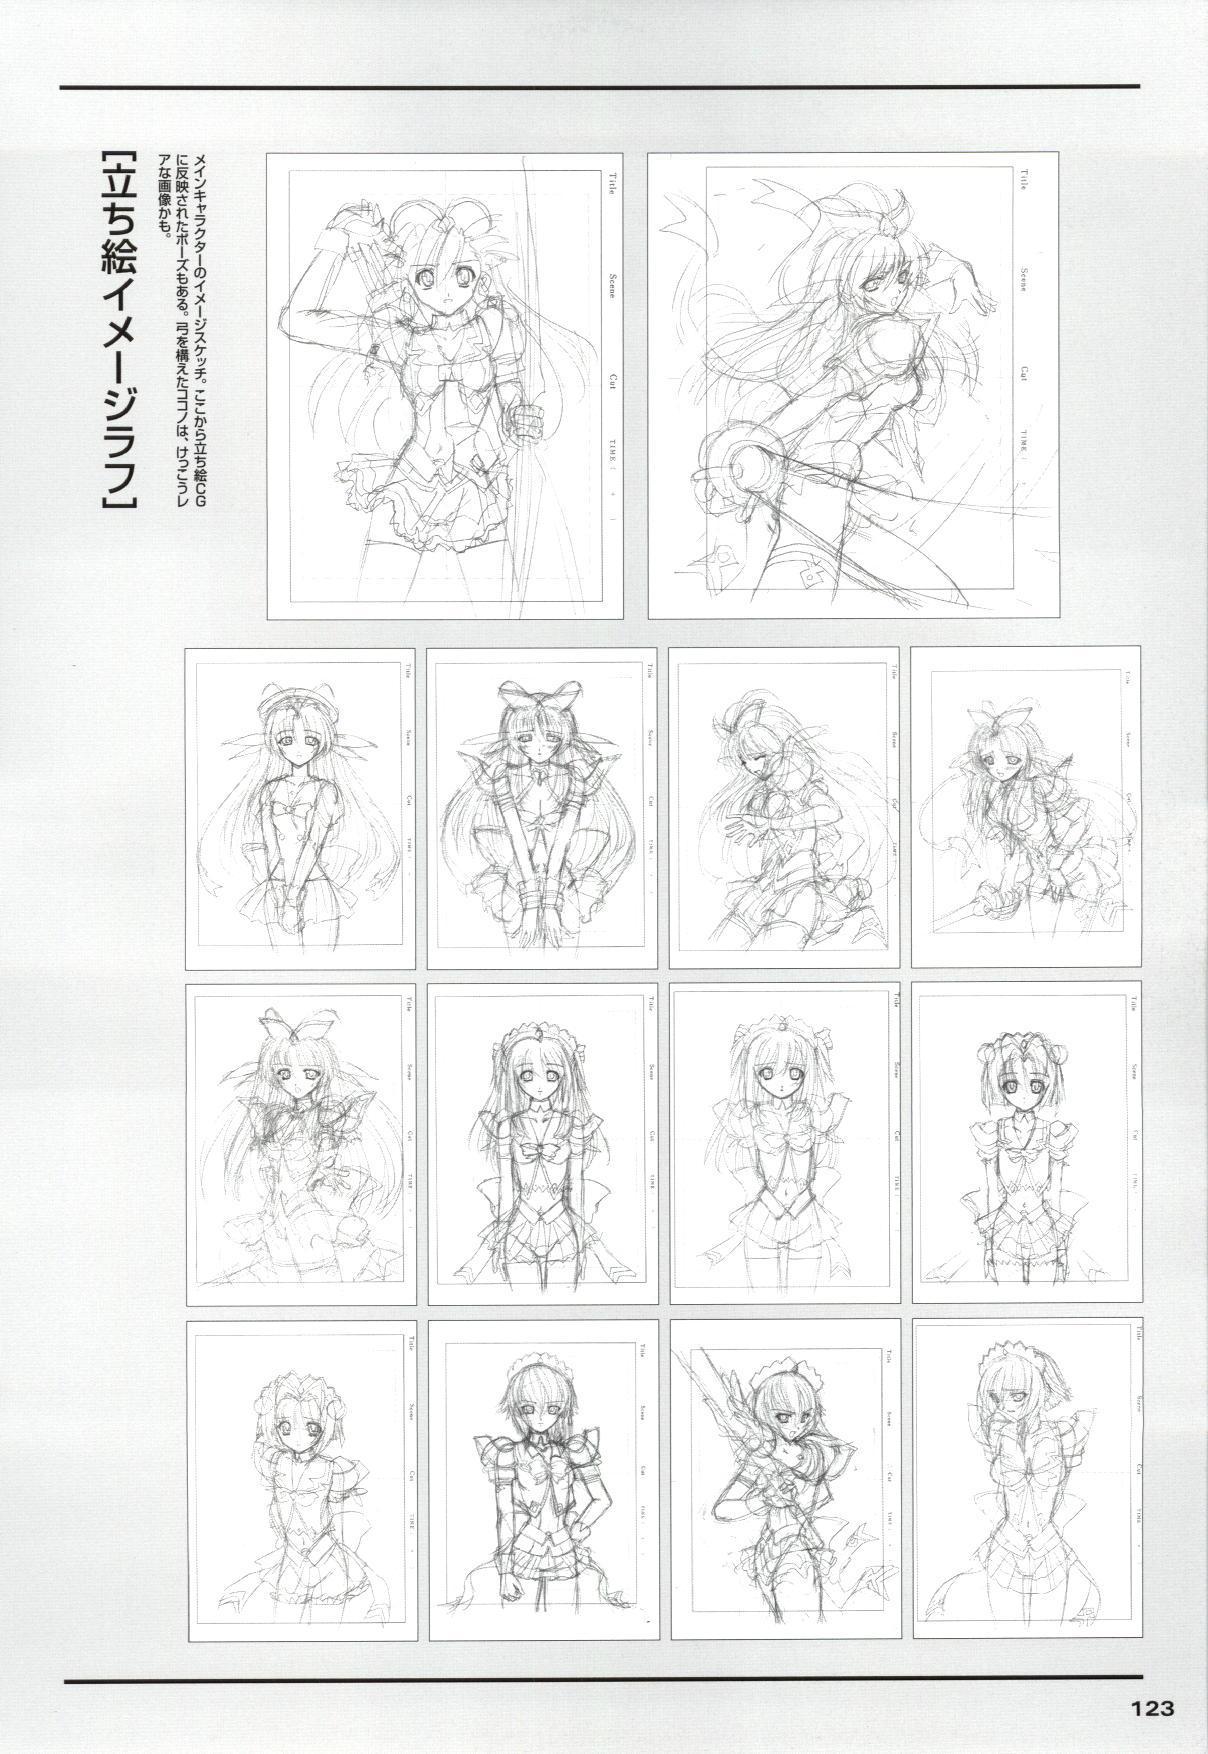 Mahou Senshi Sweet Knight & Mahou Senshi Princess Tear 122